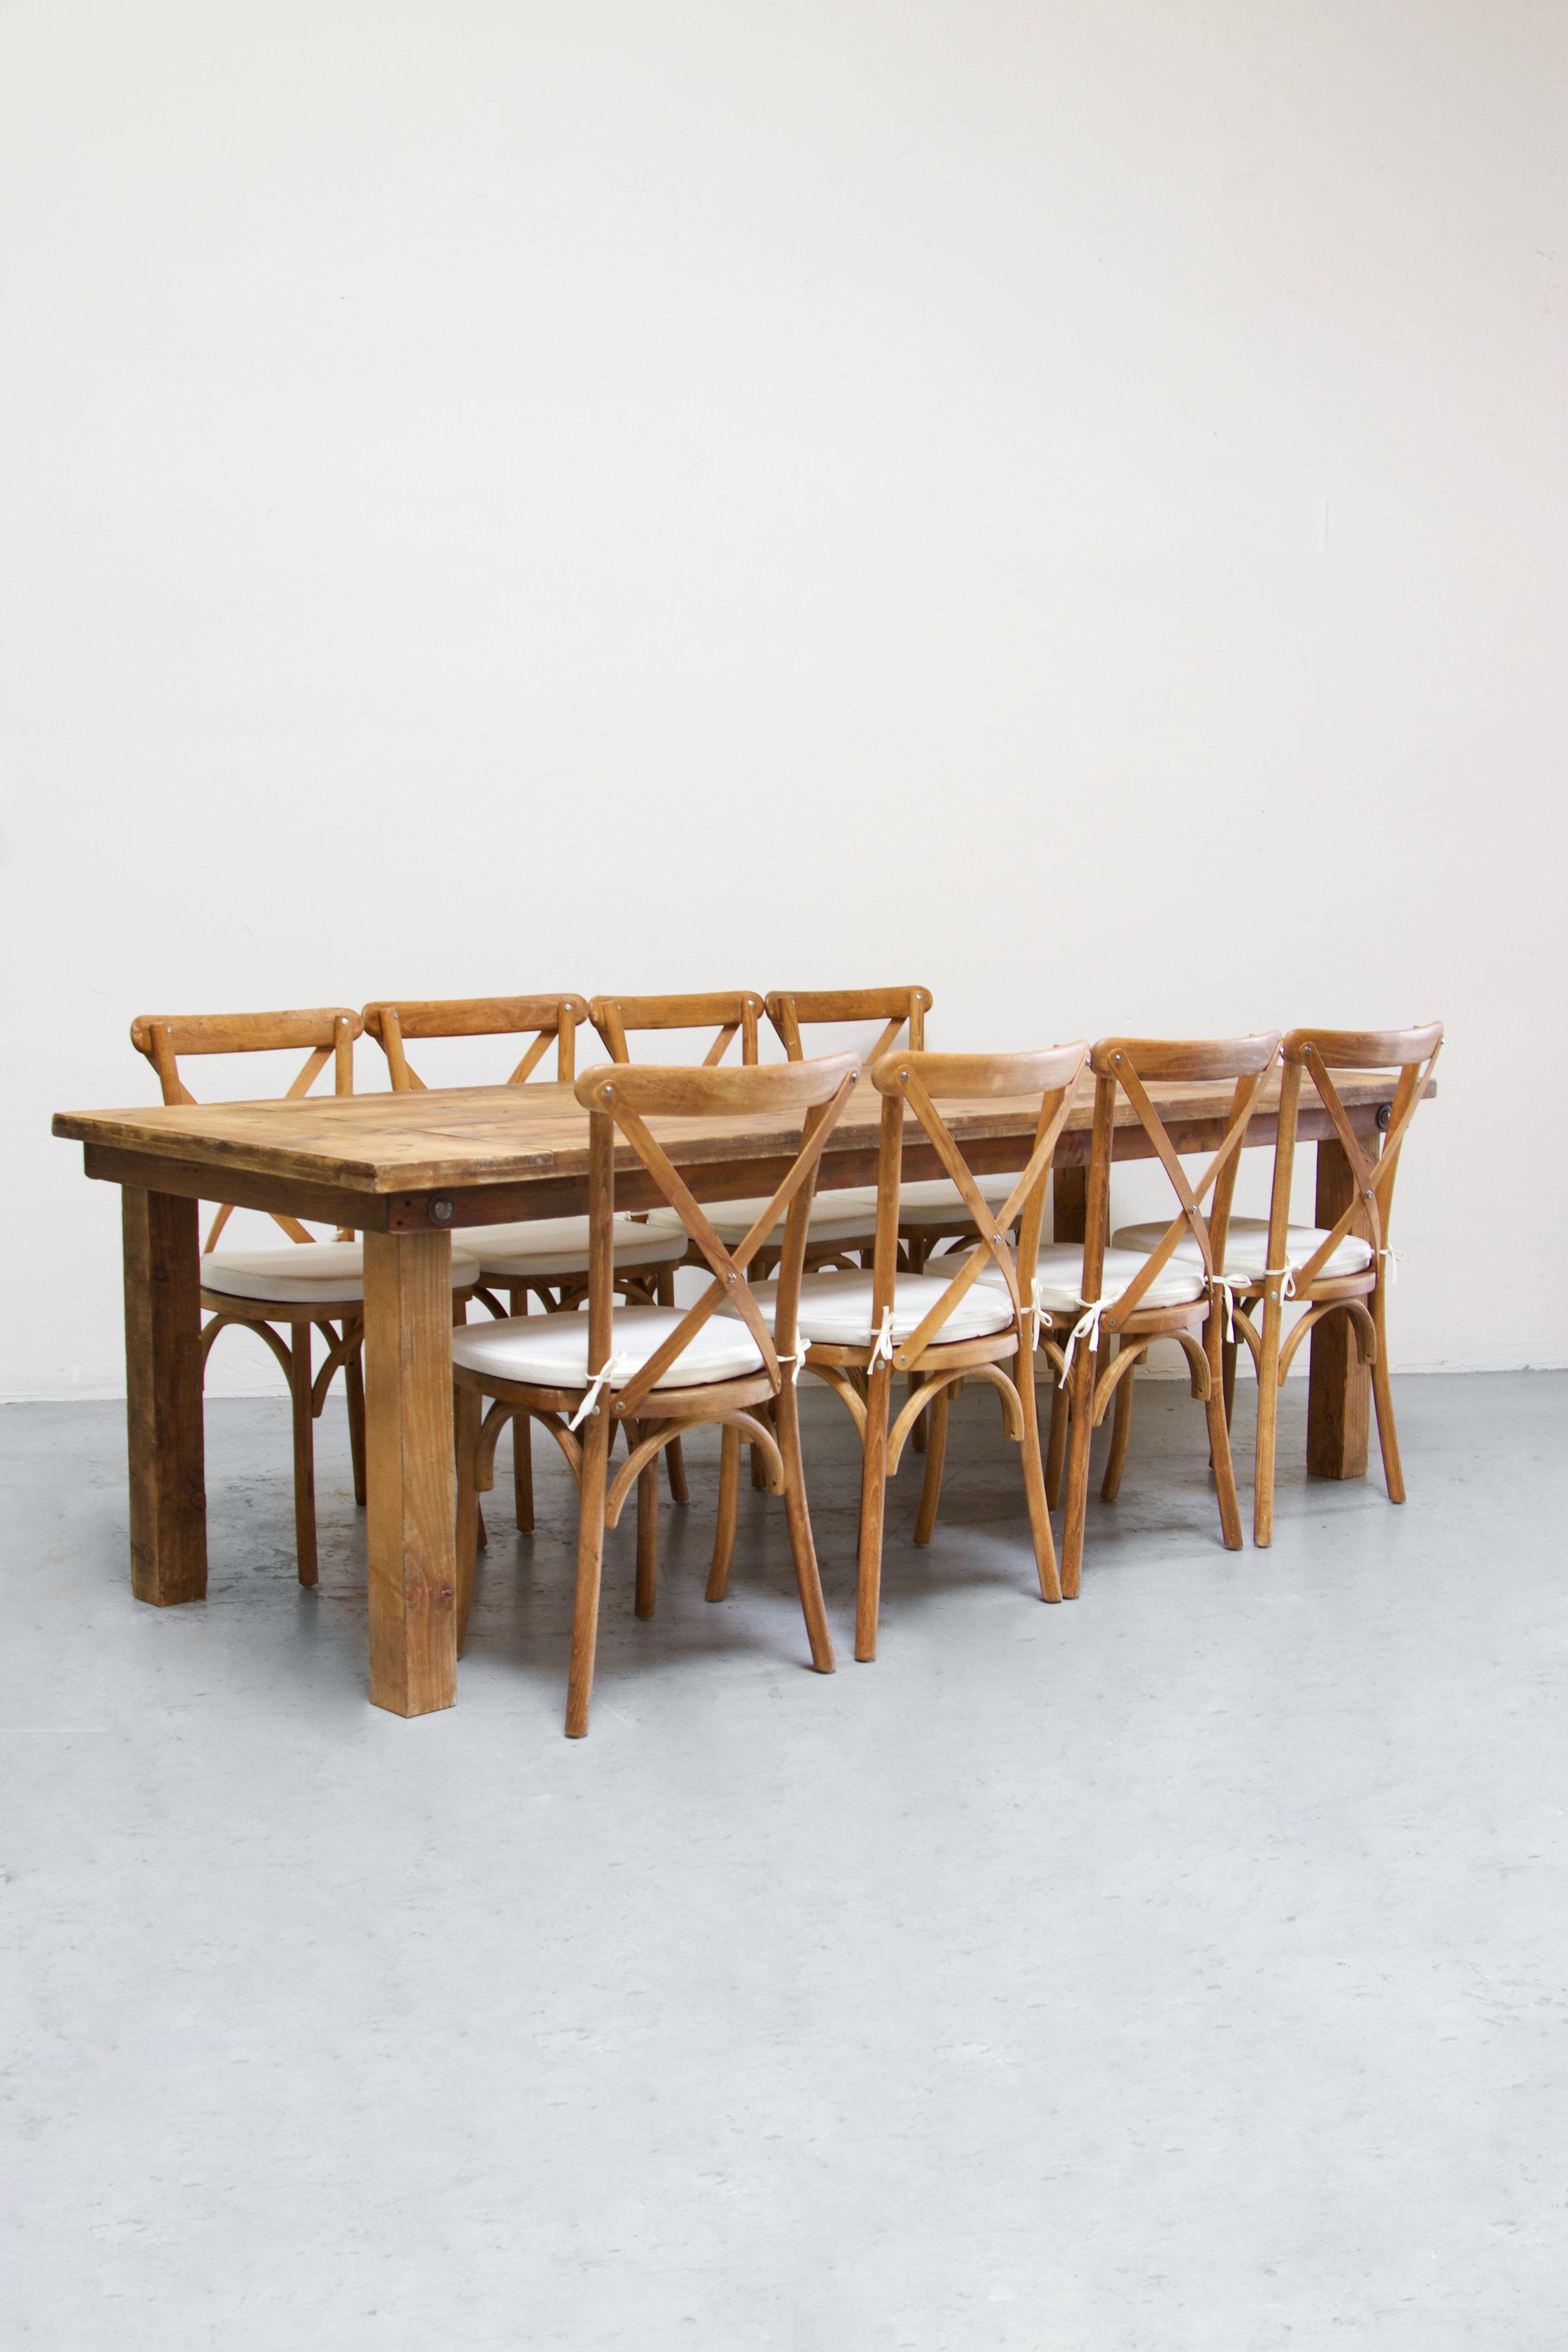 $145 1 Honey Brown Farm Table w/ 8 Cross-Back Chairs